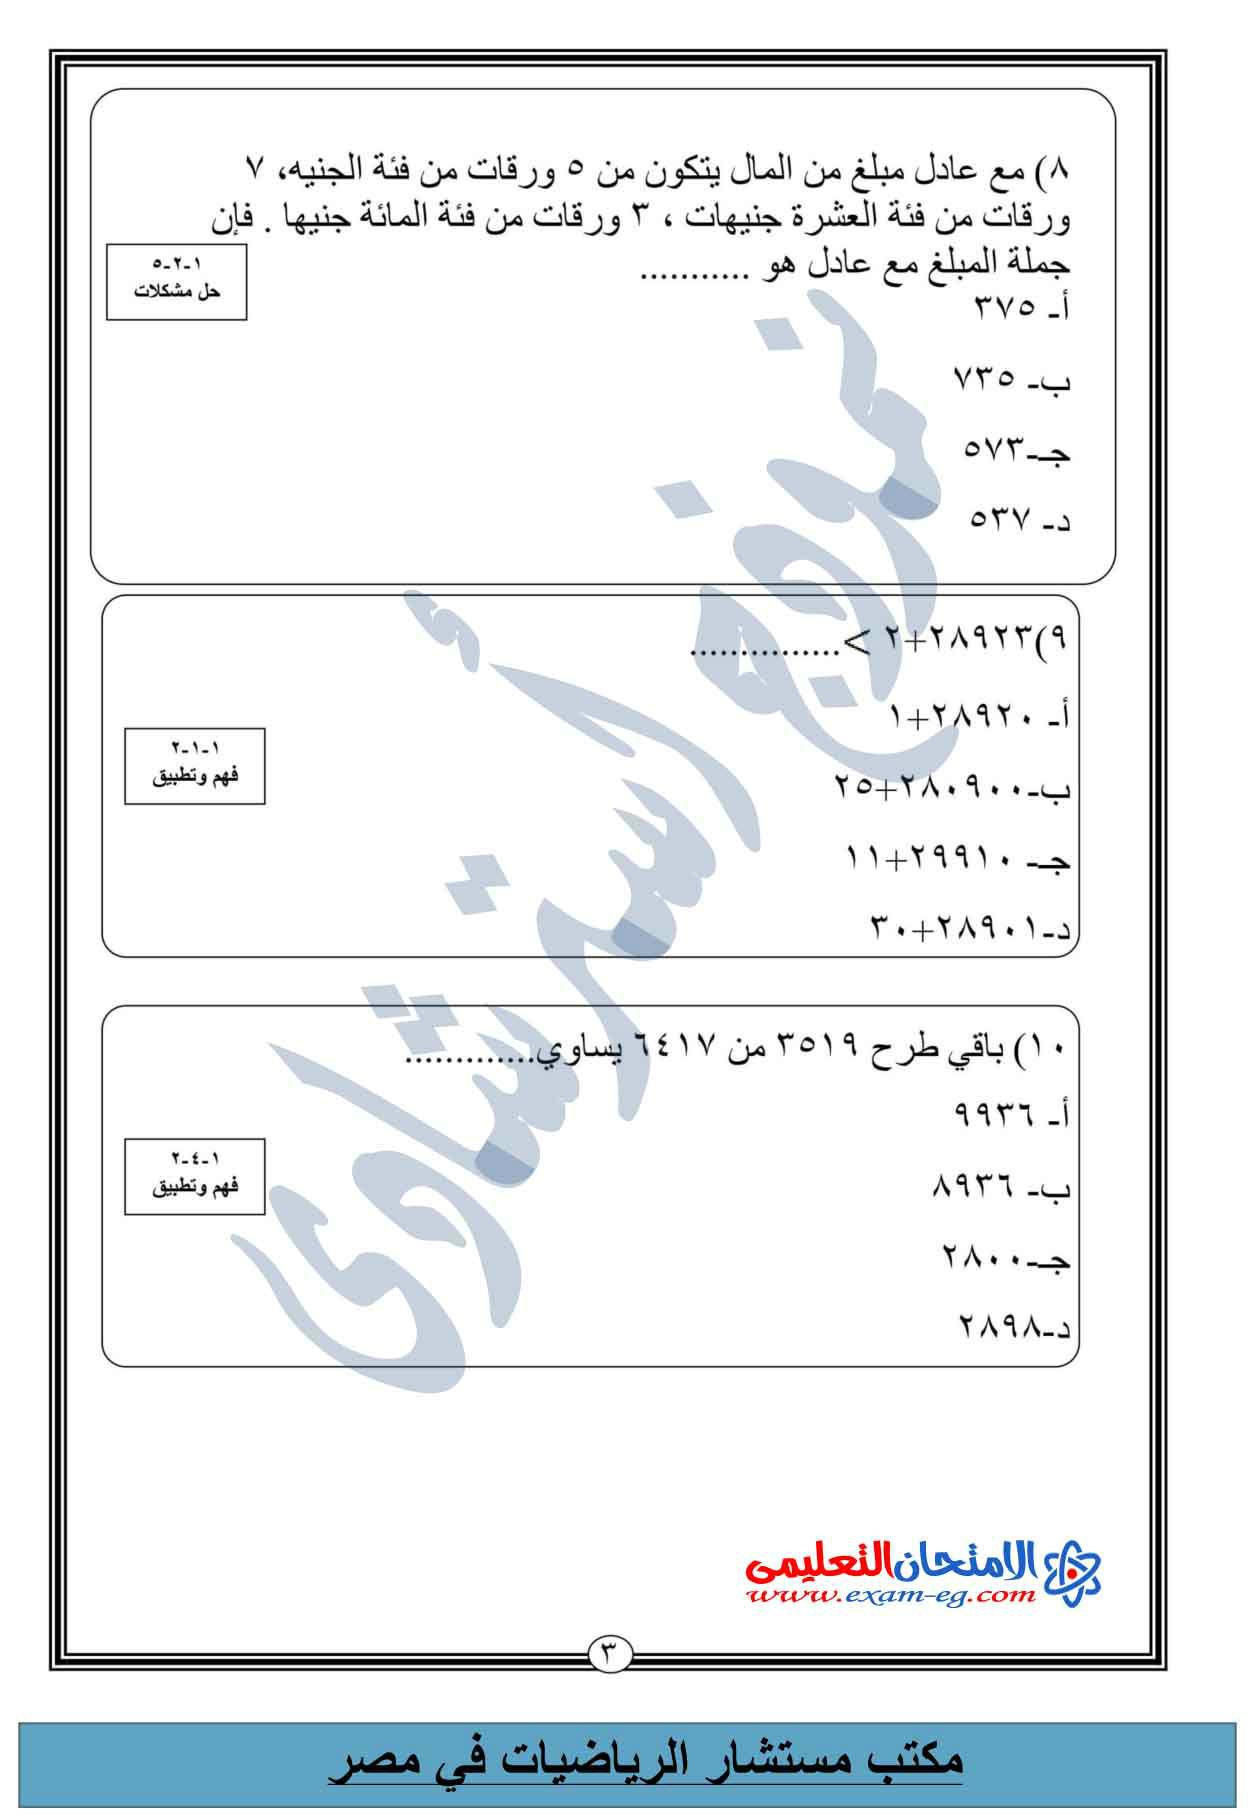 exam-eg.com_1449242034889.jpg